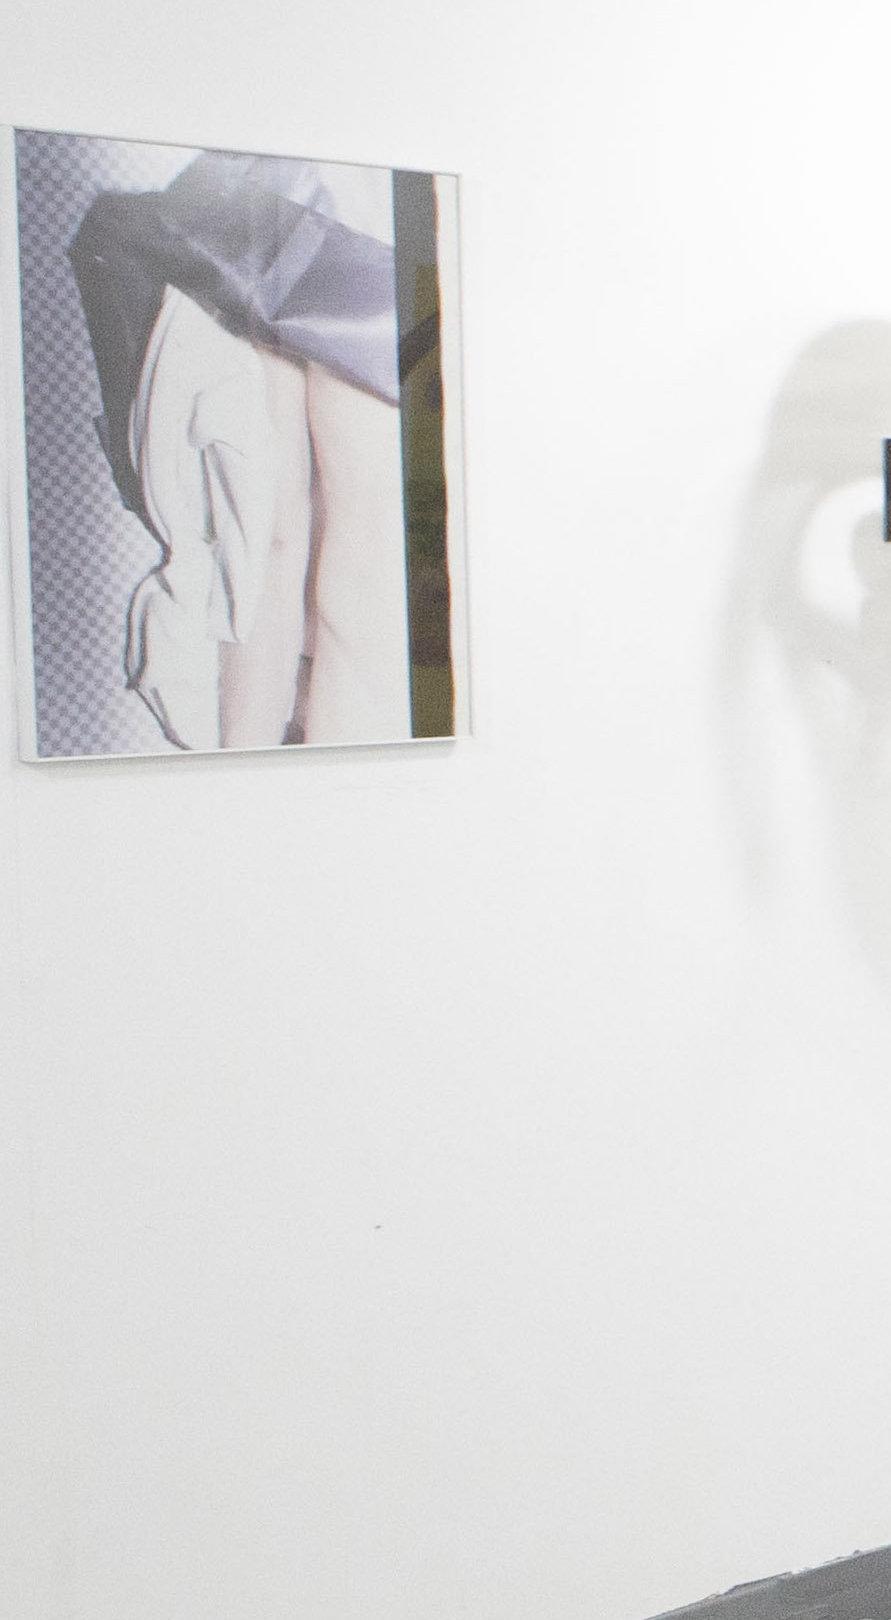 My Fairy Pleasure_03  installation view  Growing Pebbles Exhibition, 2018  SLEEPCENTER, NYC